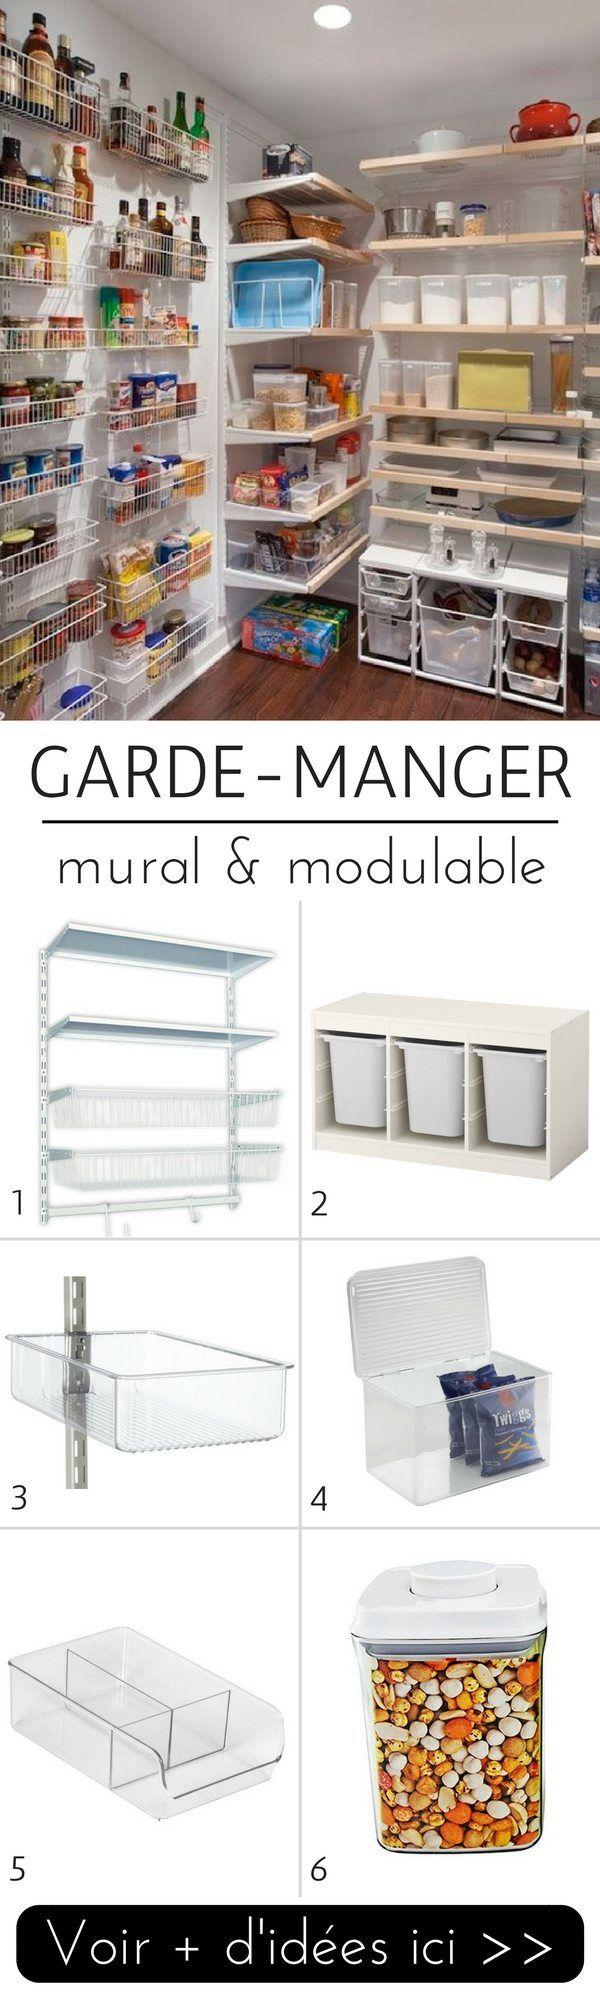 best 25 garage decorating ideas ideas on pinterest garage makeover small garage and small. Black Bedroom Furniture Sets. Home Design Ideas